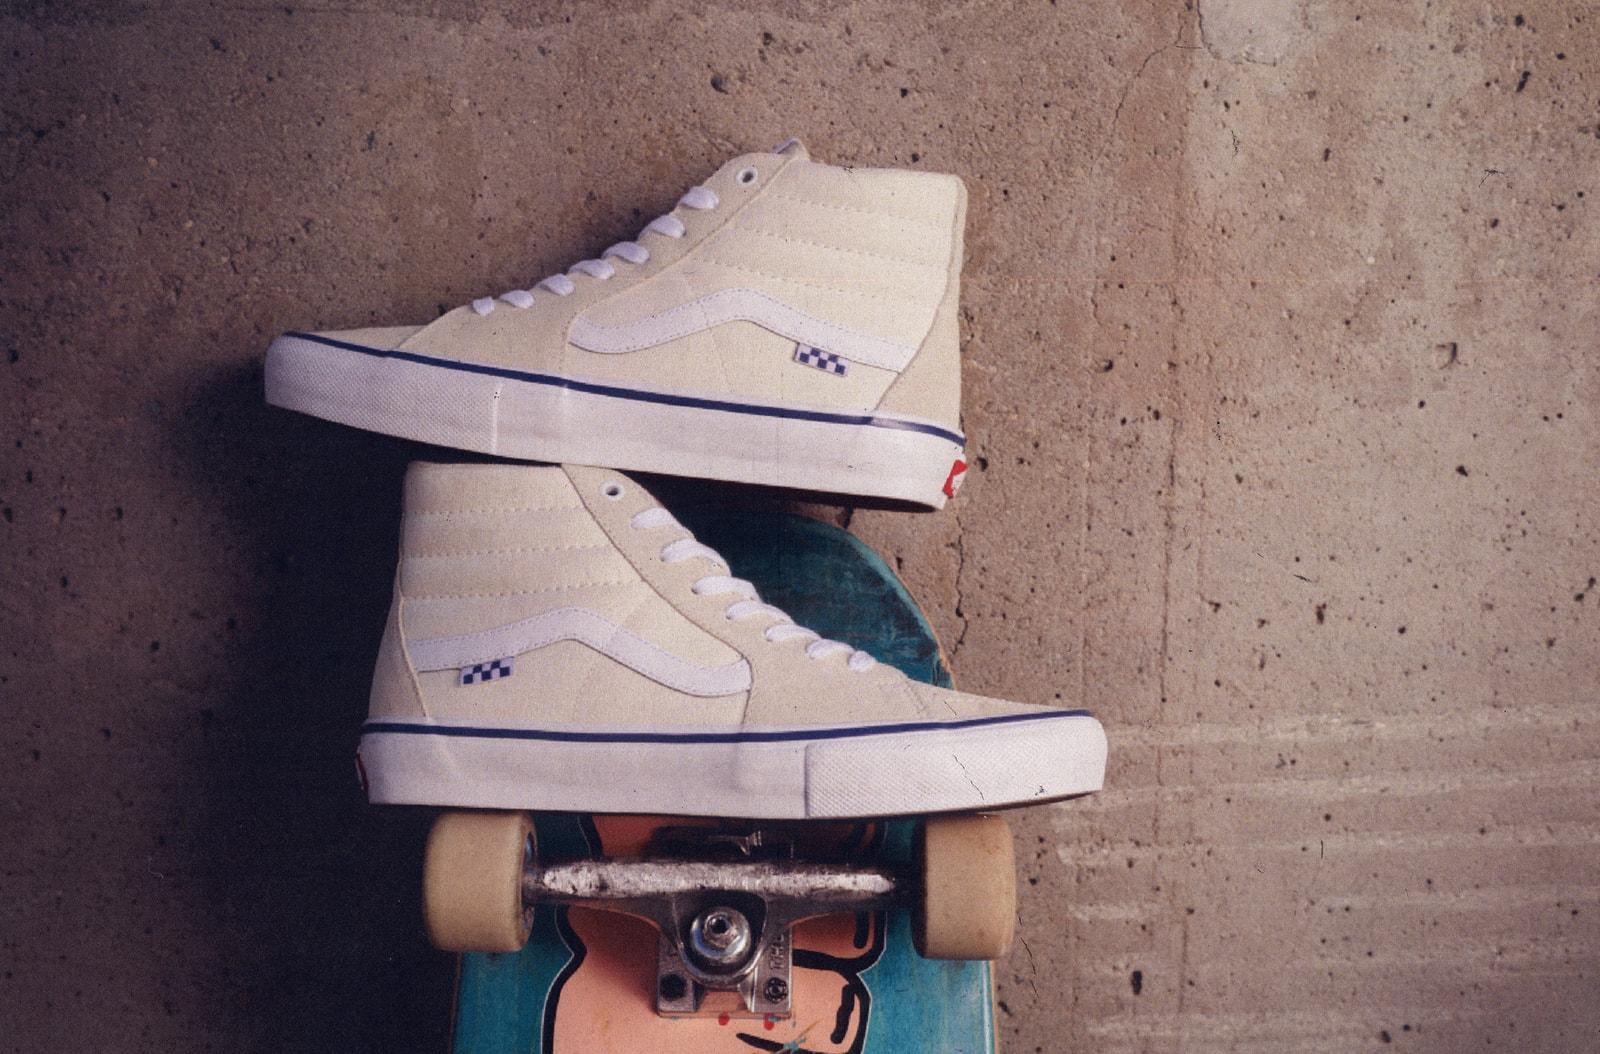 Vans Introduces All-New Skate Classics